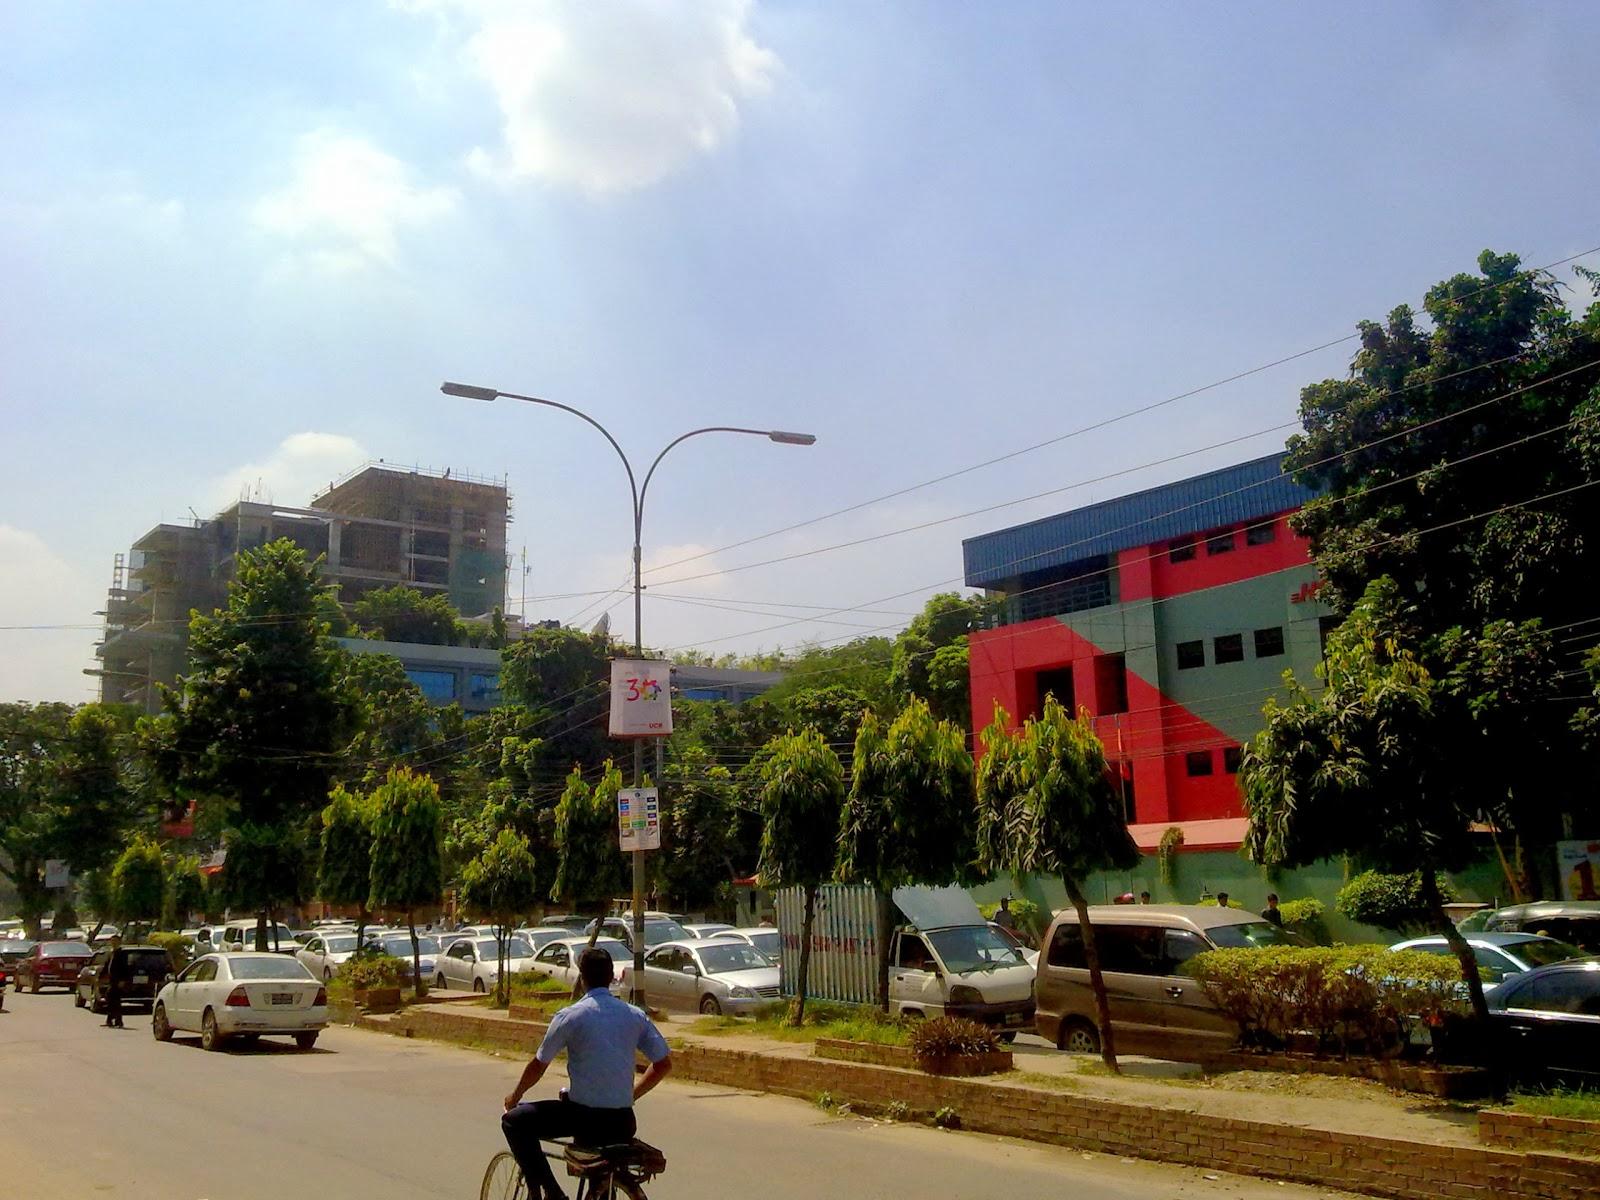 Gulshan Avenue in Dhaka